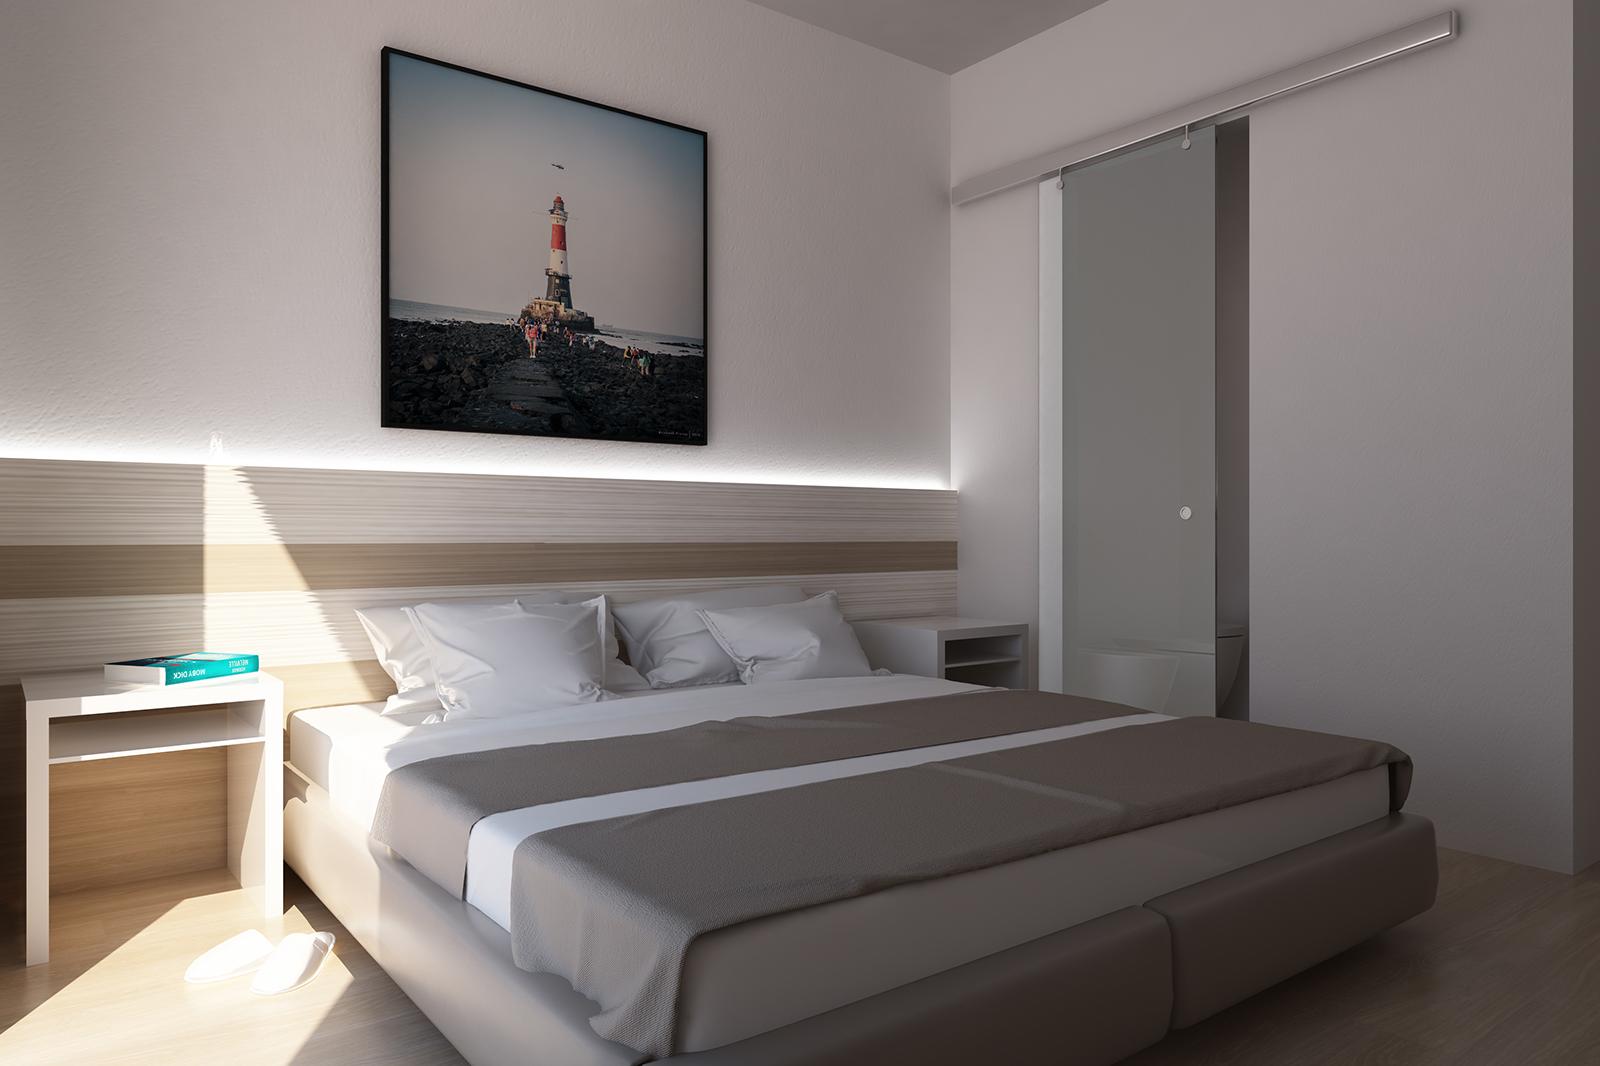 Hotel Portofino Caorle - 2-Sterne-Hotel in Caorle